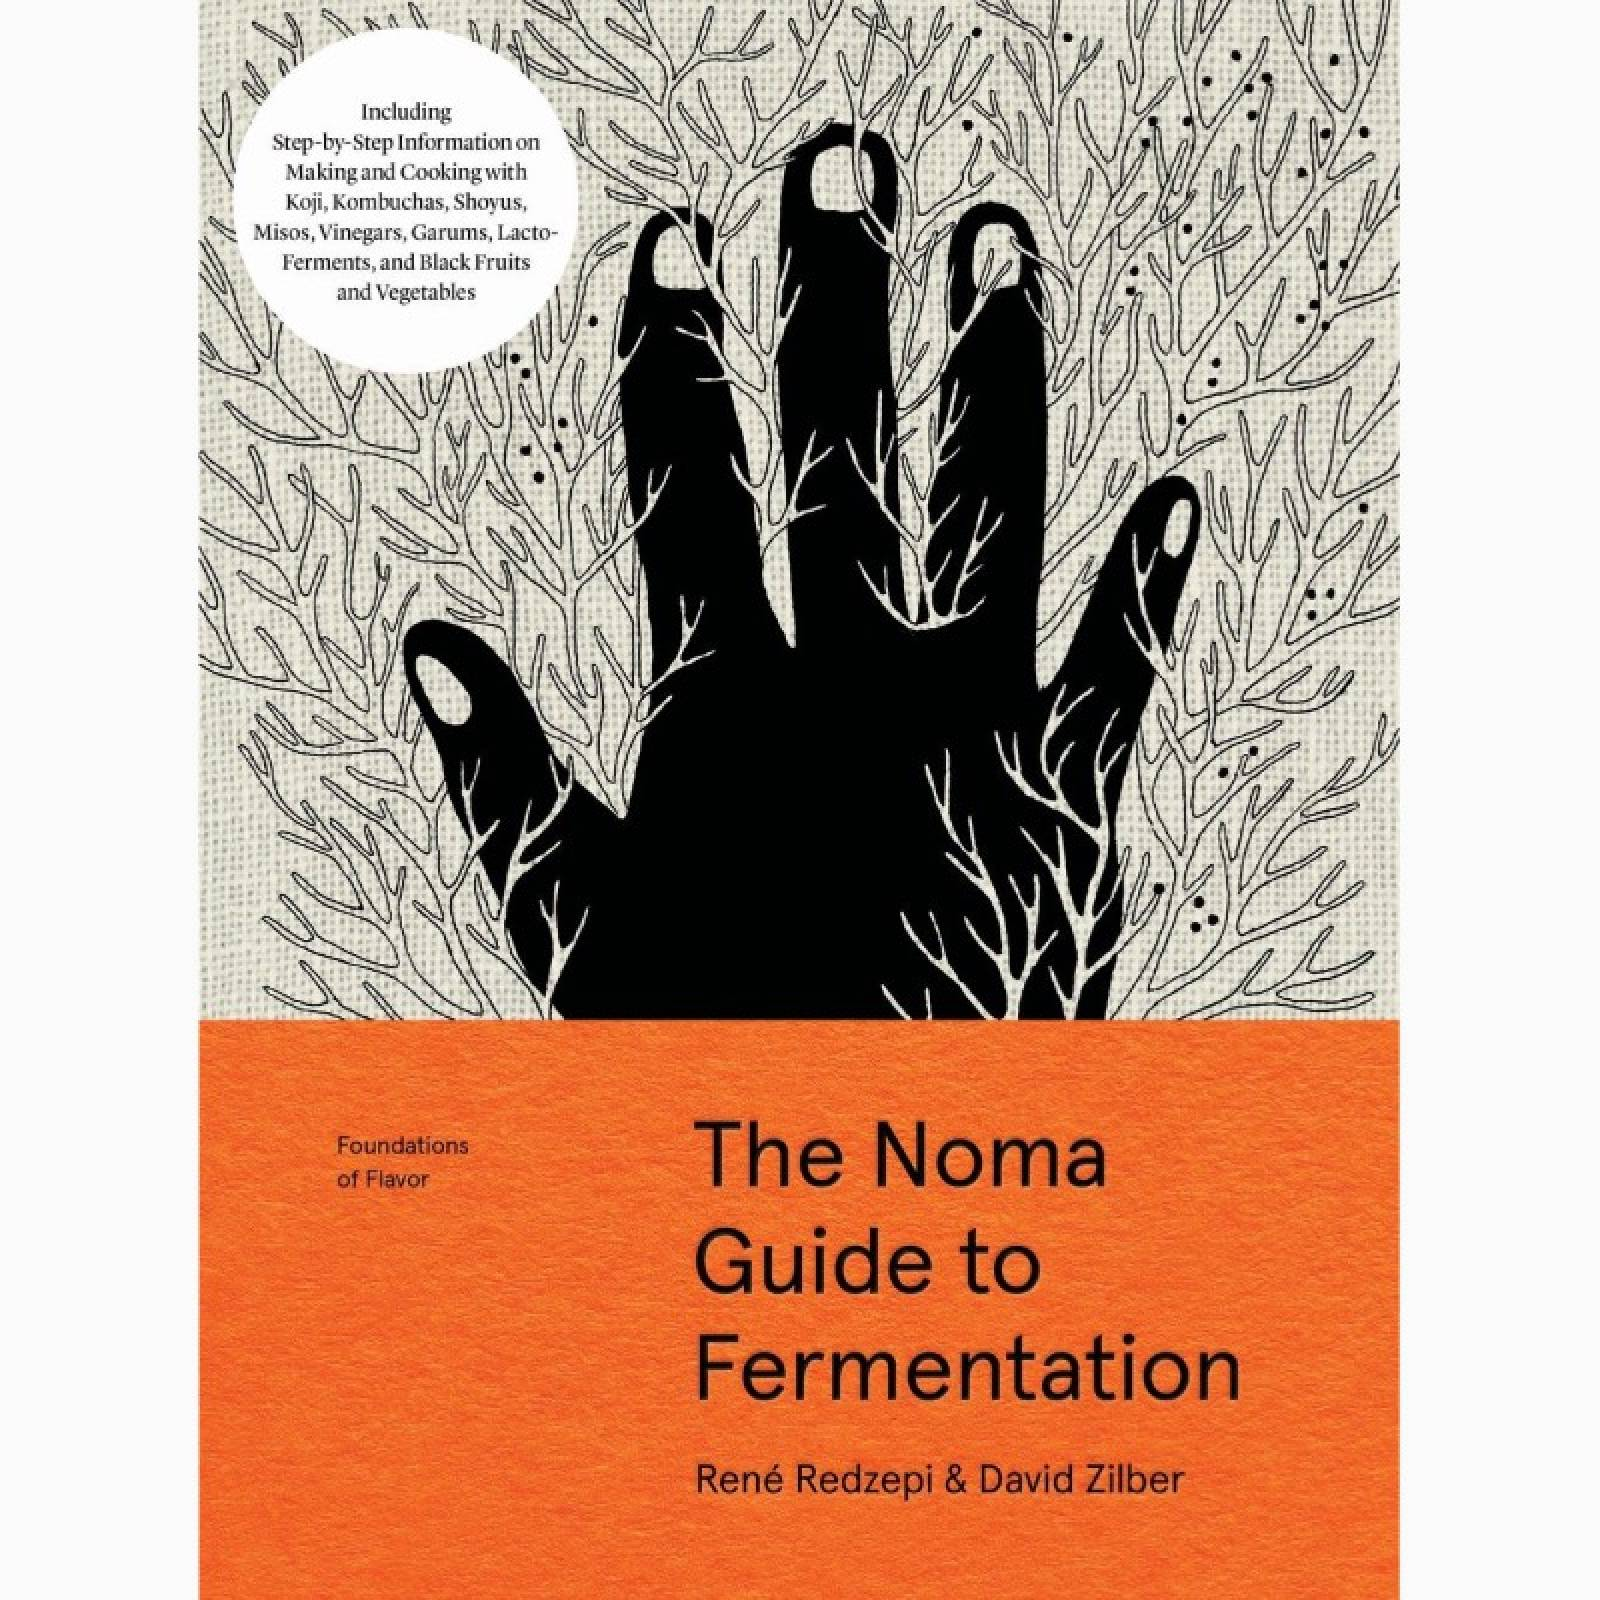 The NOMA Guide To Fermentation - Hardback Book